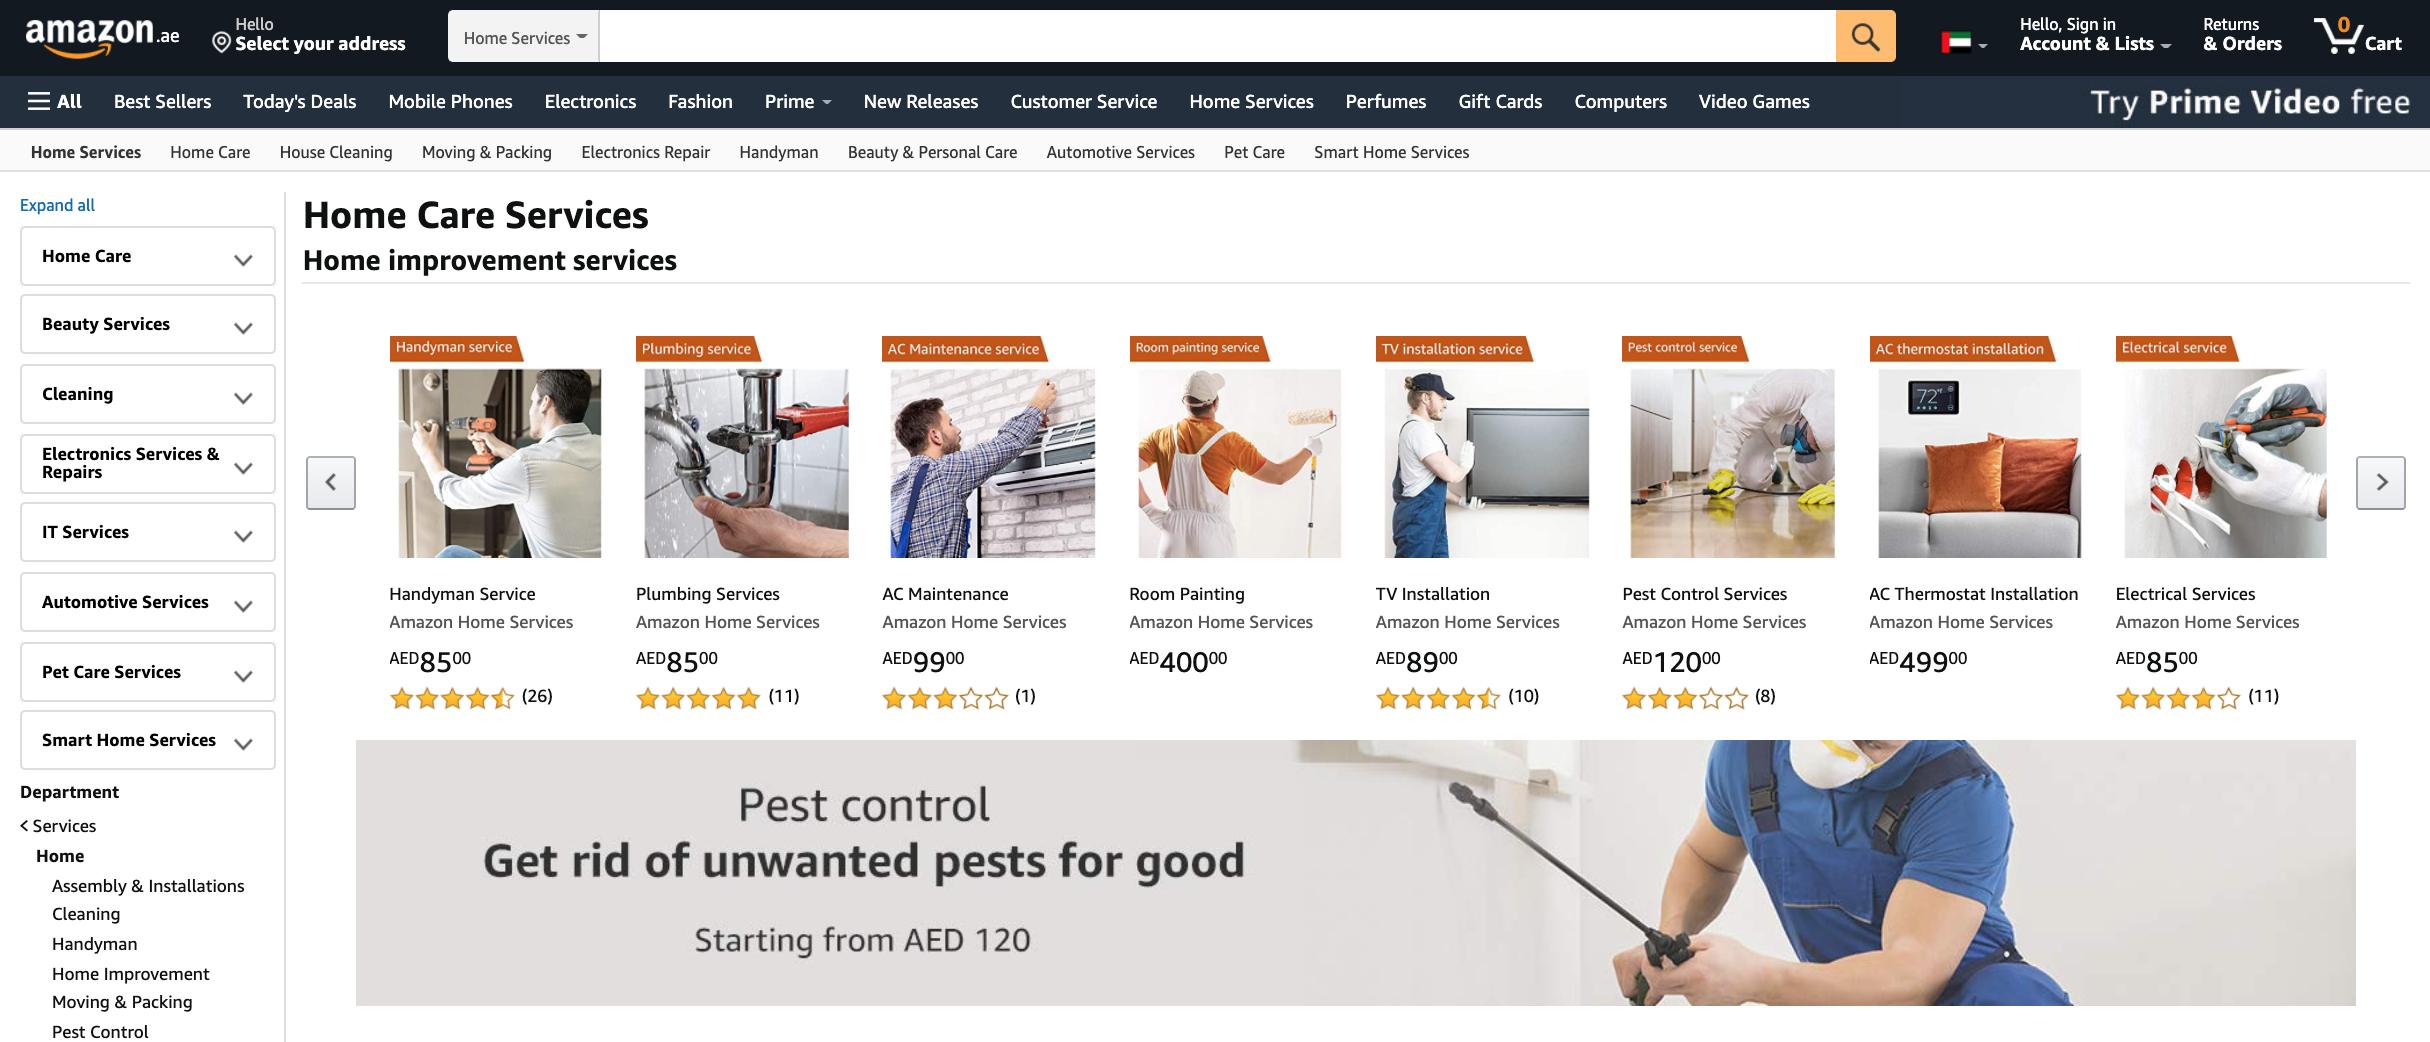 Amazon.ae Home Care Services